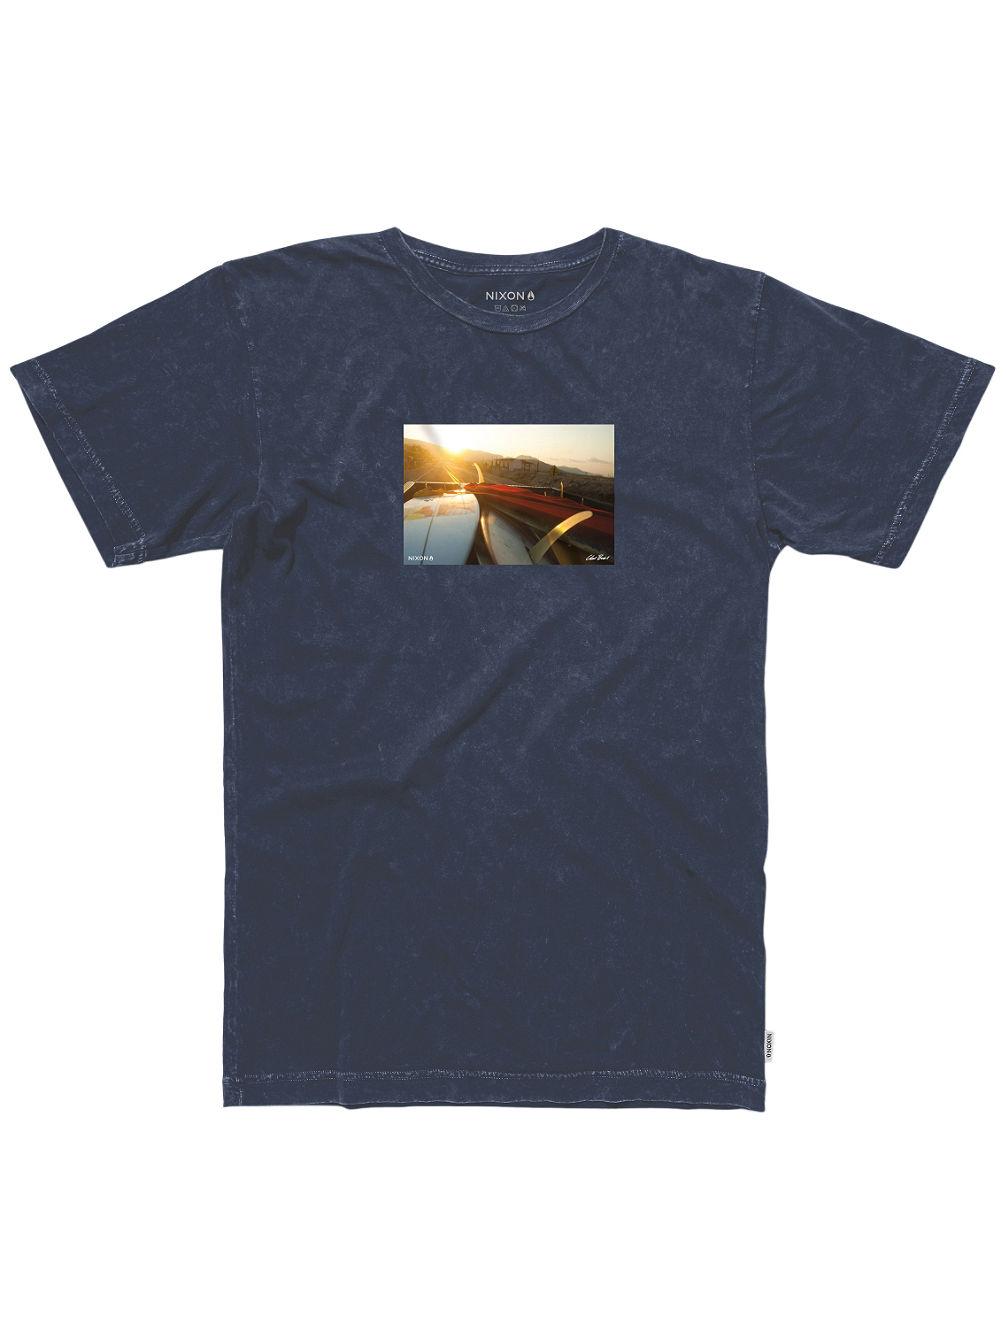 rays-t-shirt